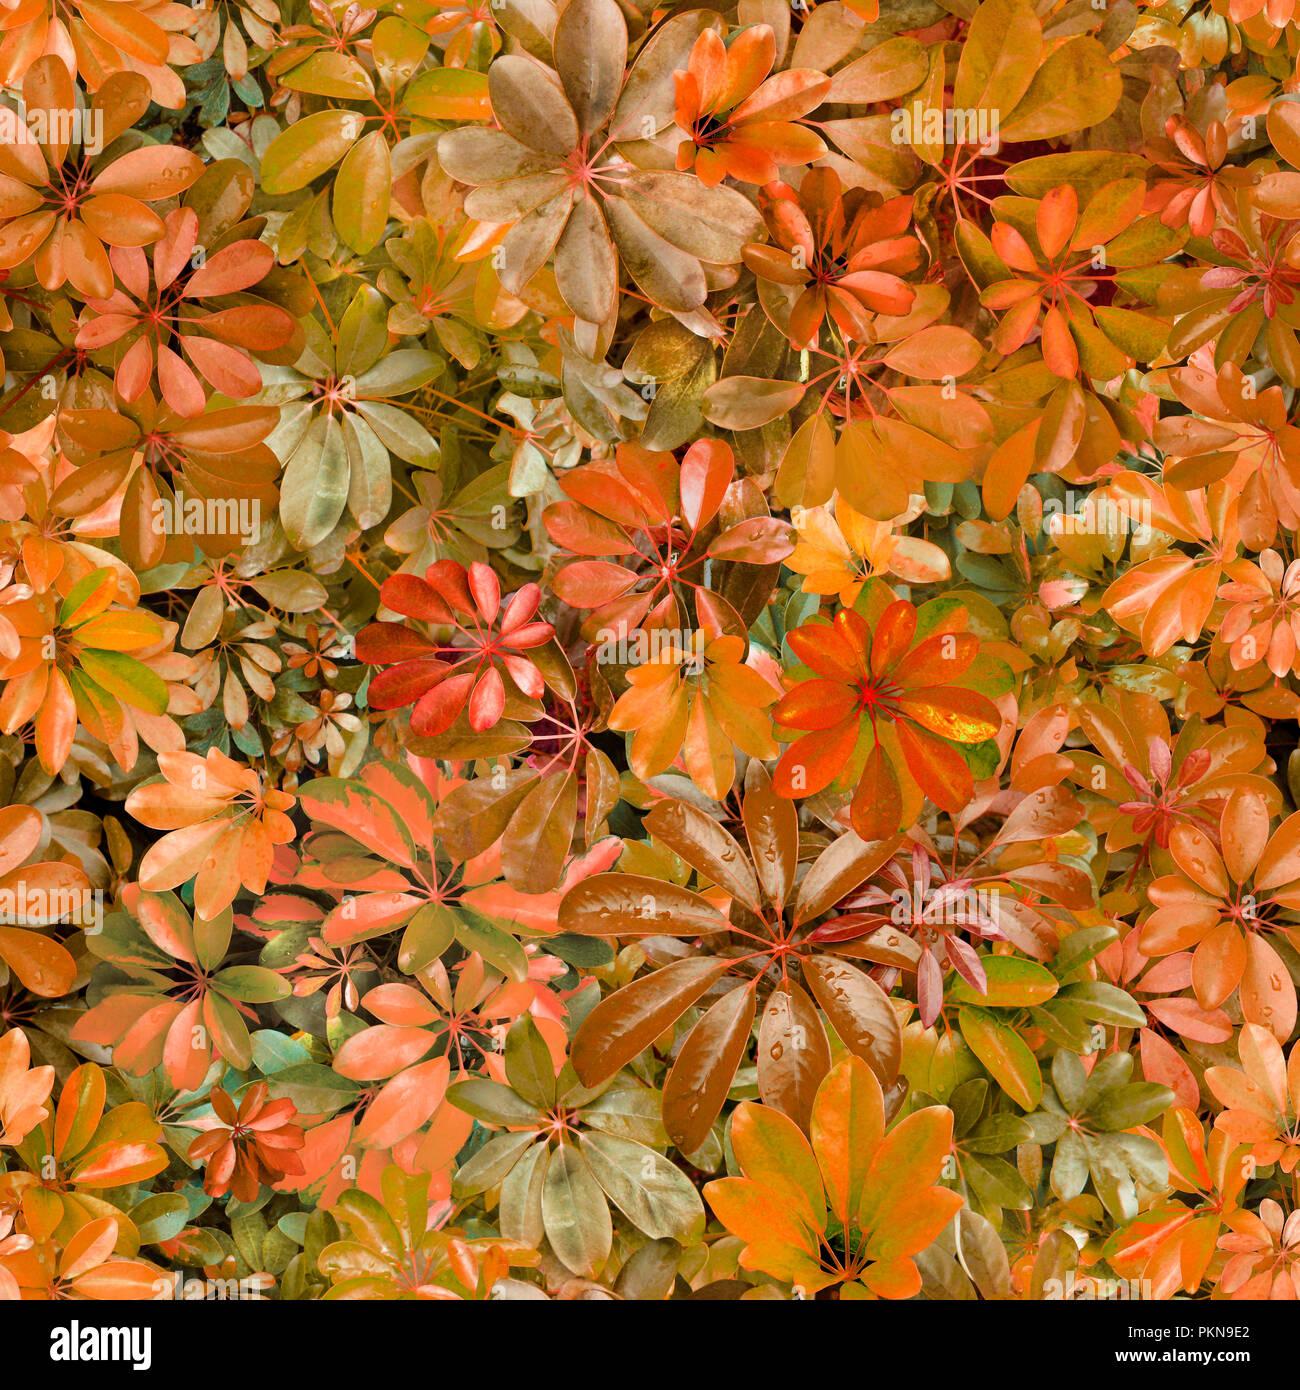 Seamless pattern, leaves, summer, orange, heat, flora, wallpaper pattern, pattern for textiles, postcard, nobody, design, image, photo - Stock Image